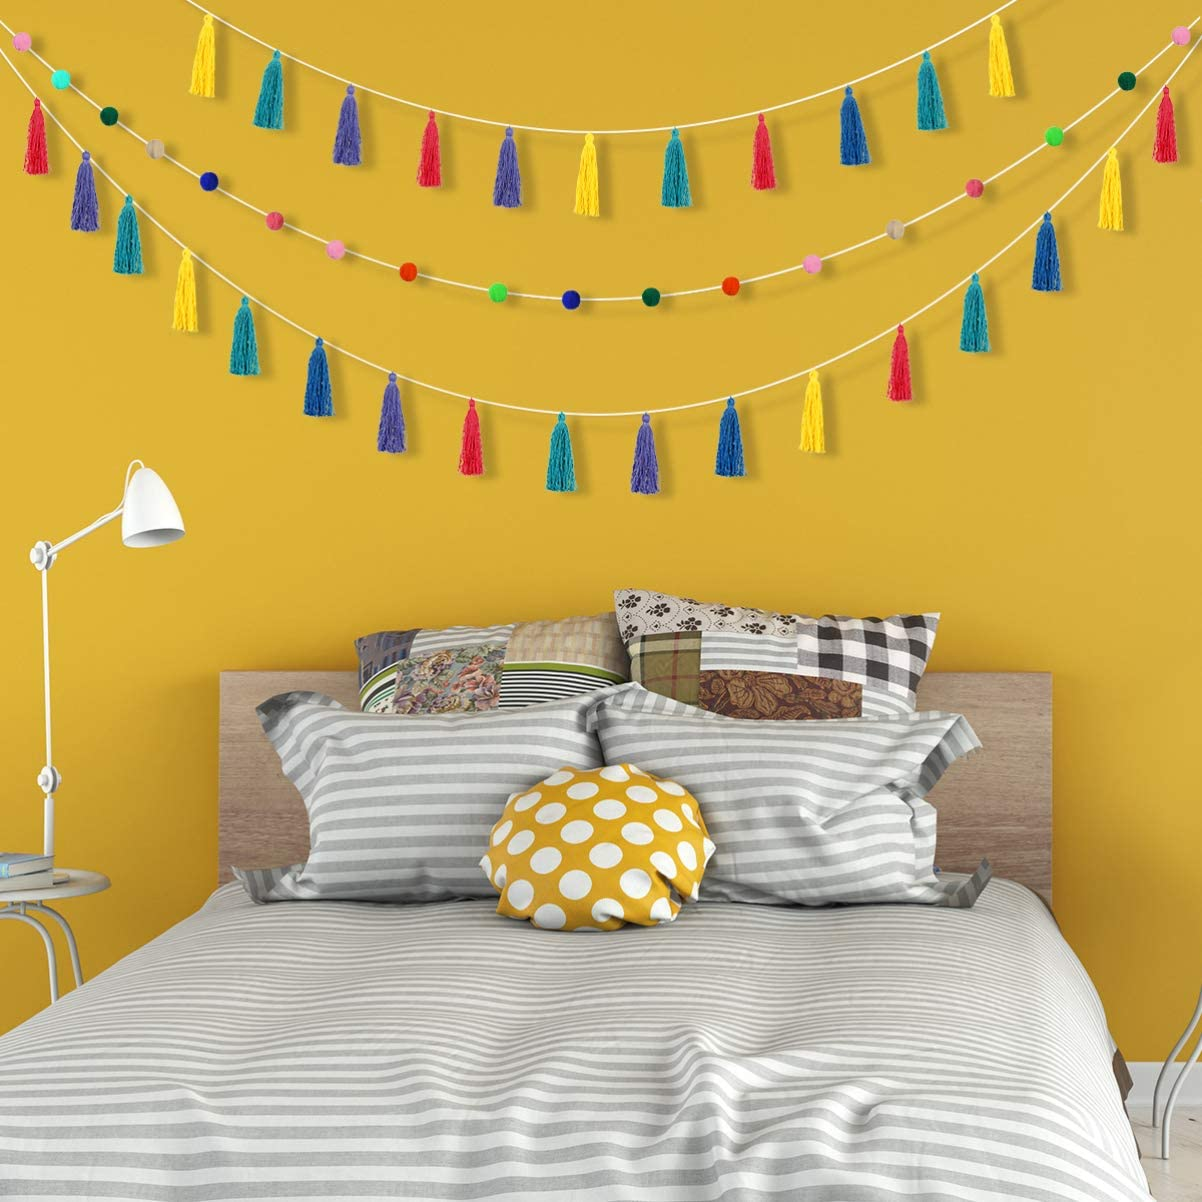 Tassel Garland Pom Pom Ball Garland Living Room Wall Decoration Colorful Tassel Banner 2 Pack